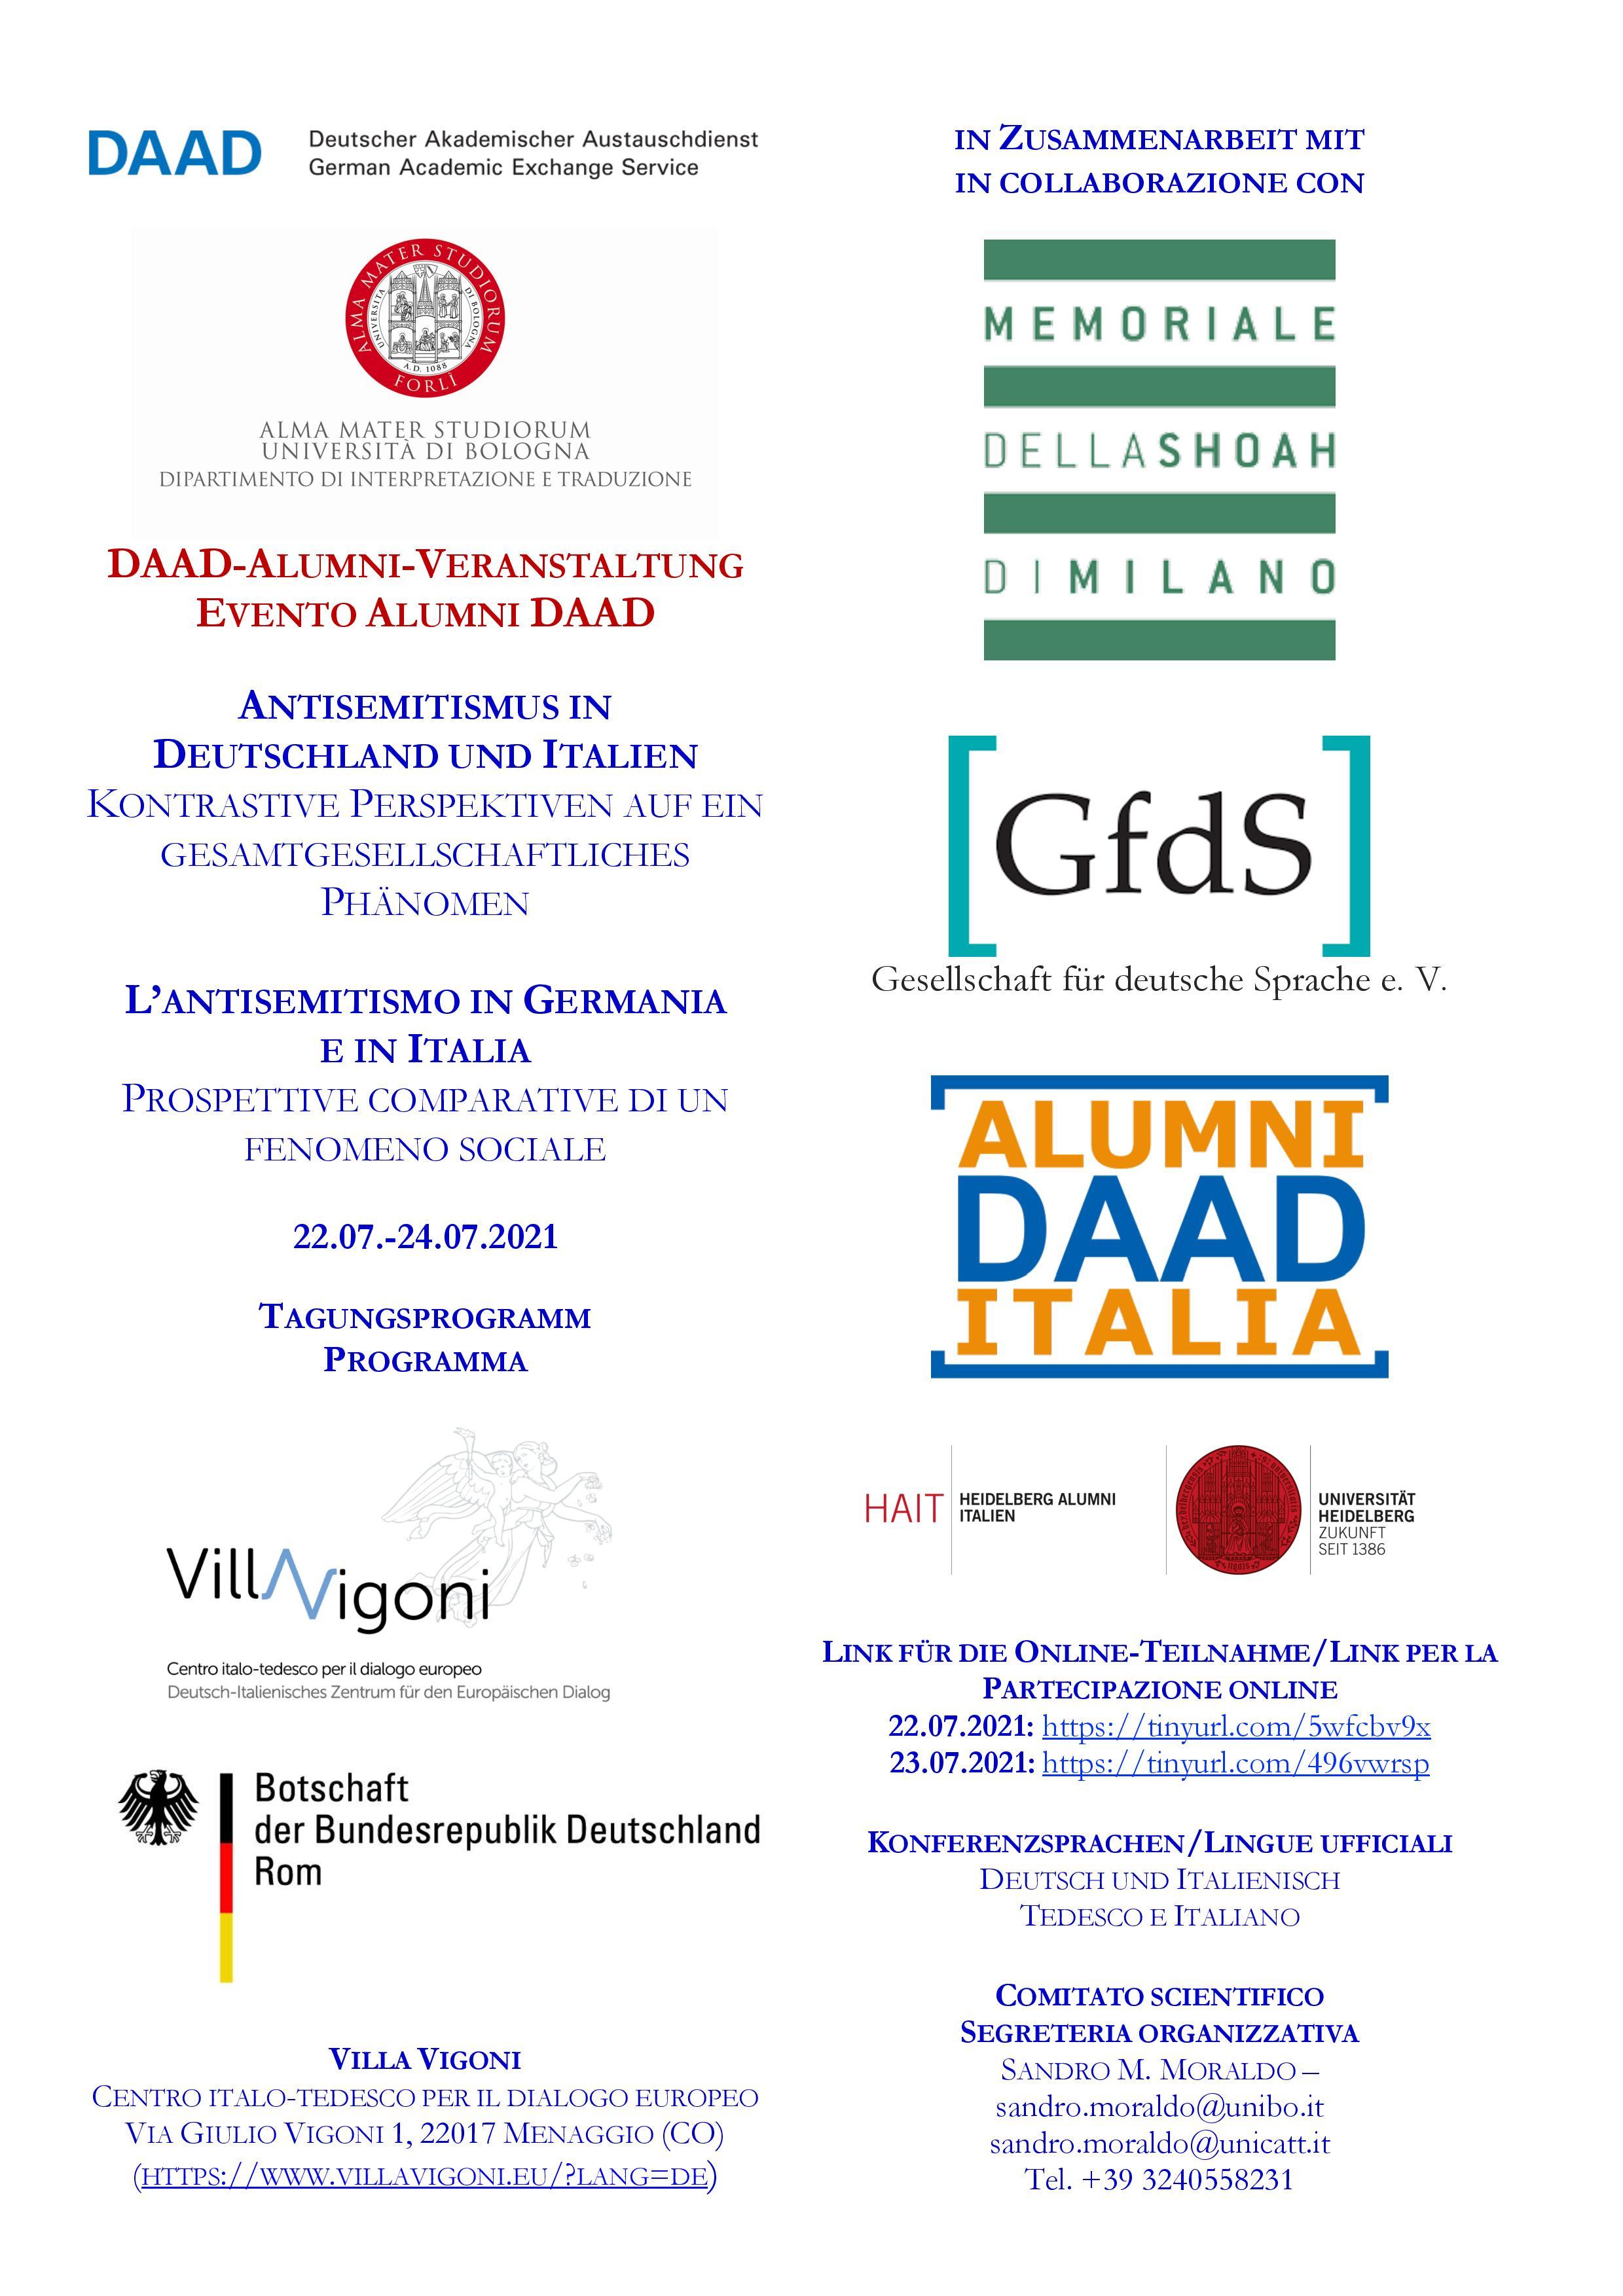 DAAD-Alumni-Veranstaltung.Antisemitismus.Programm.1-page-001 (1)